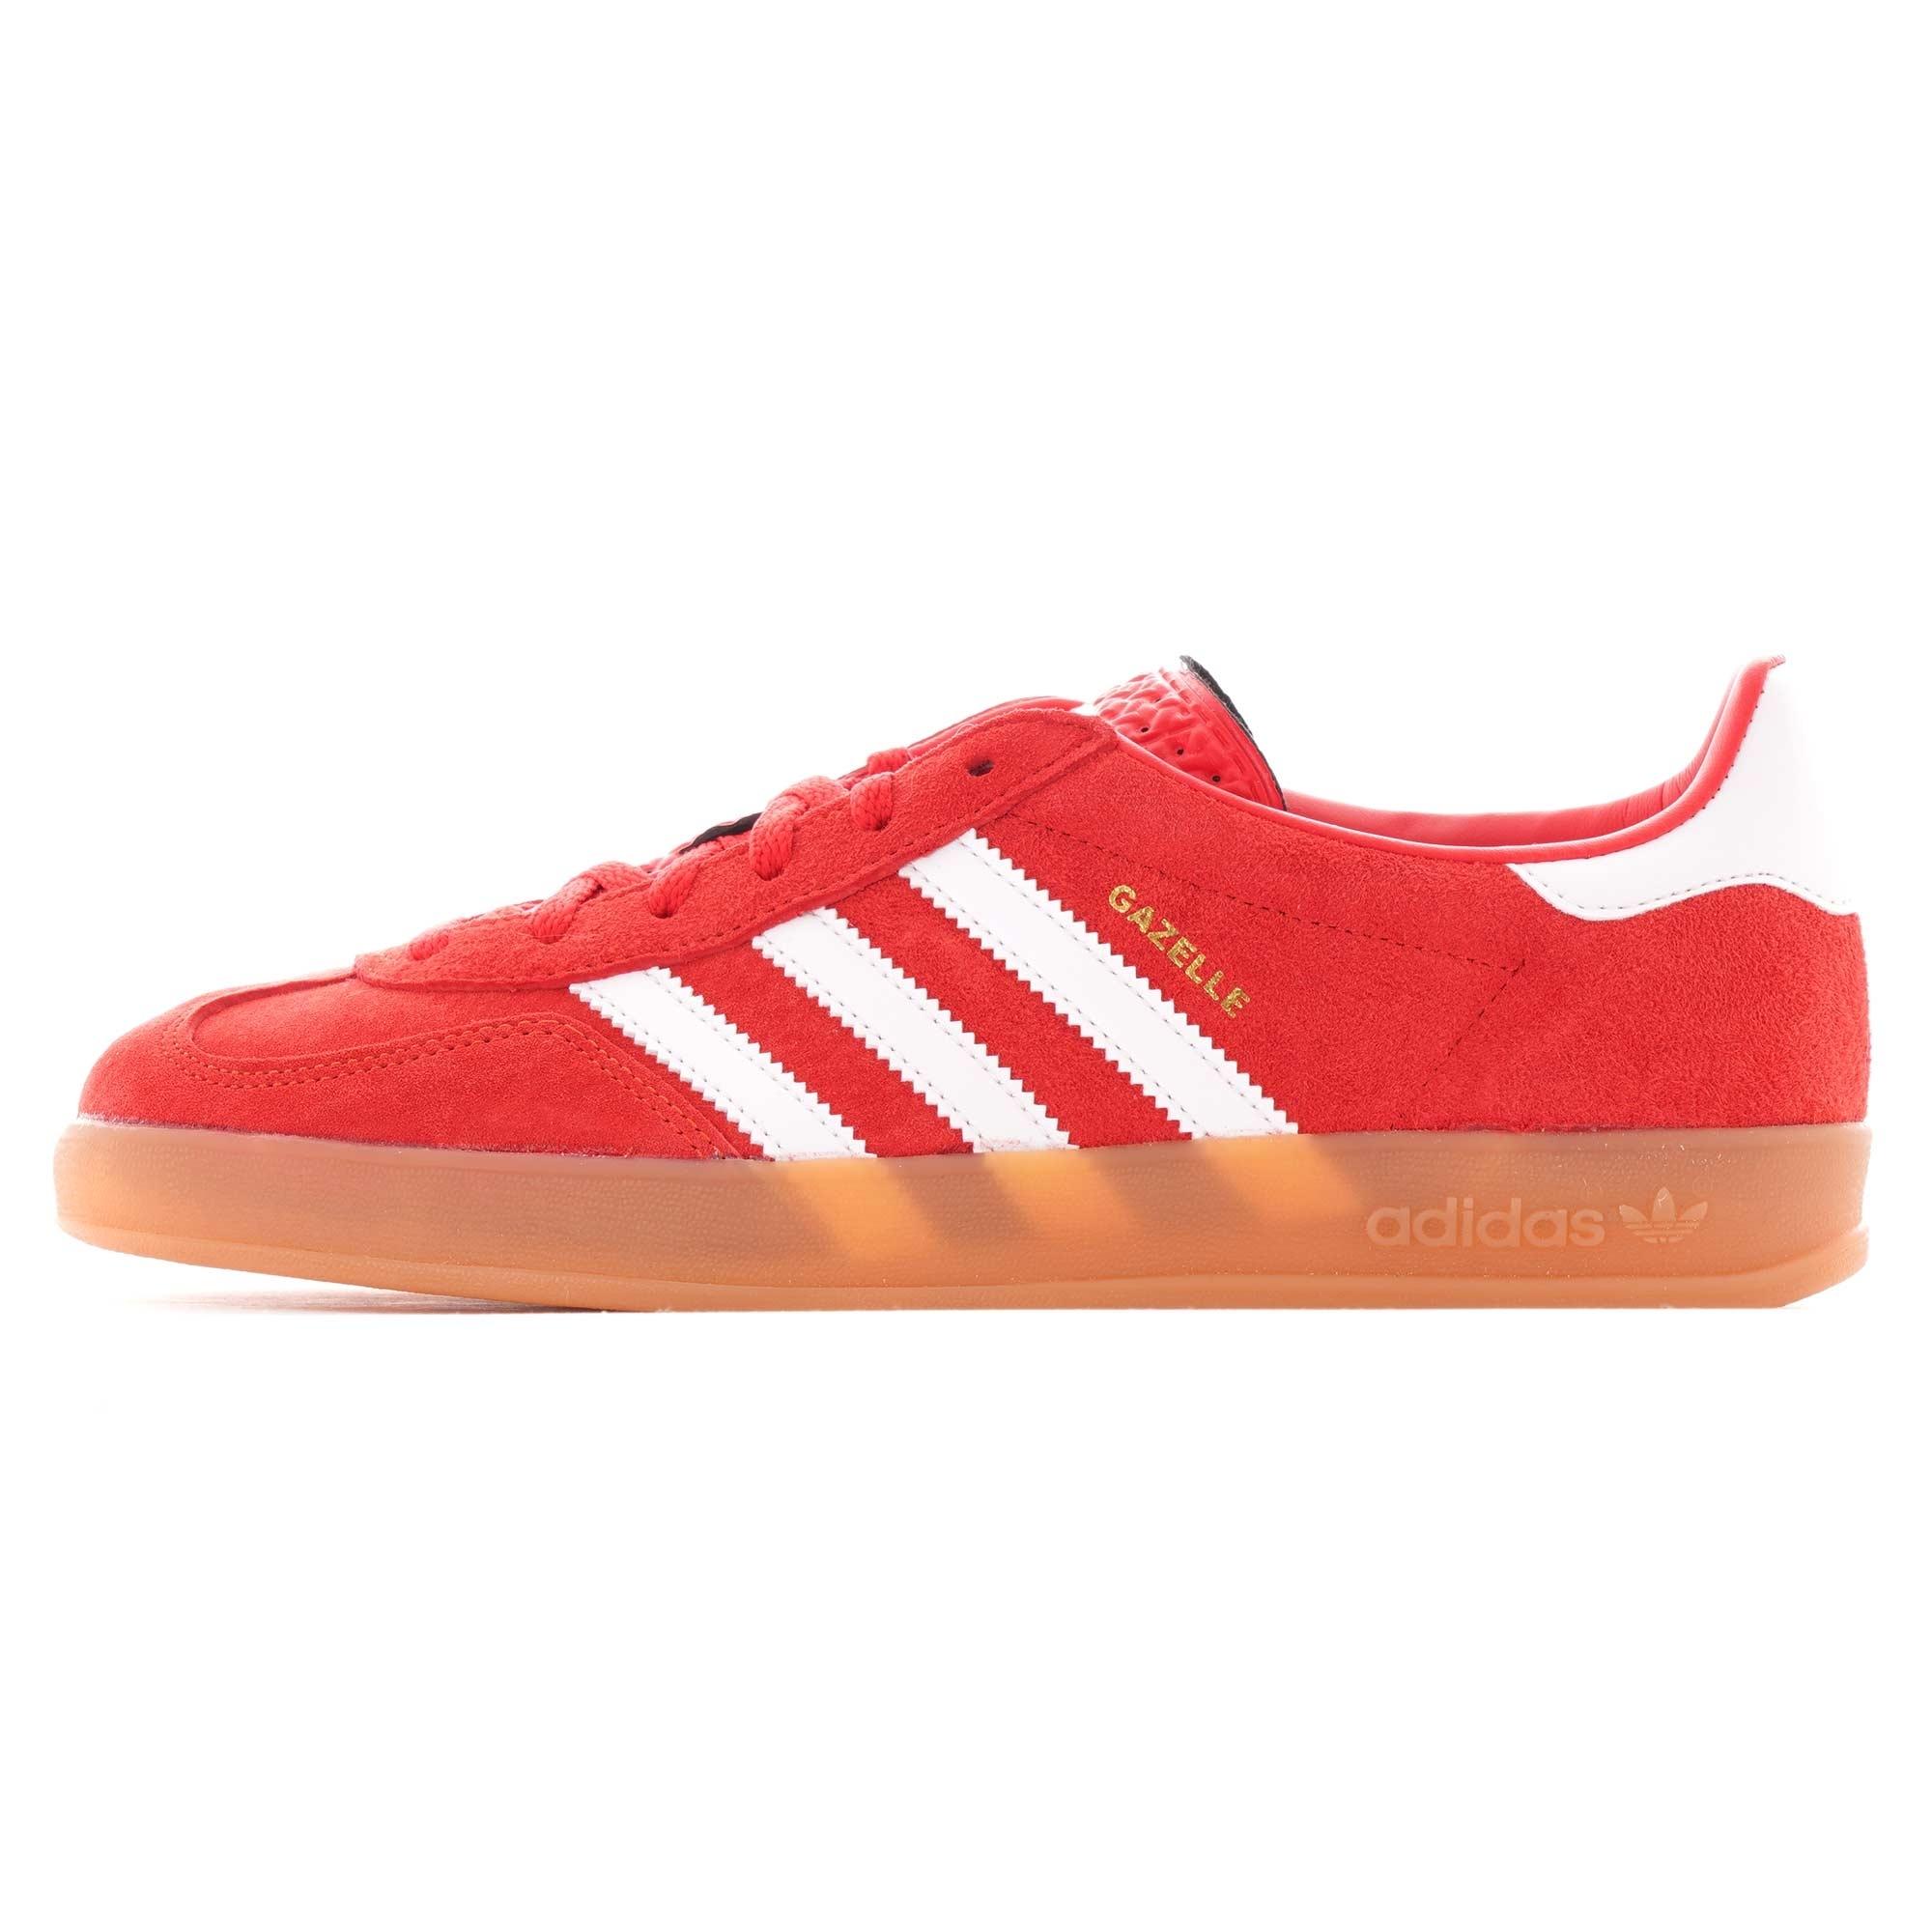 Adidas Originals Gazelle Indoor - Red